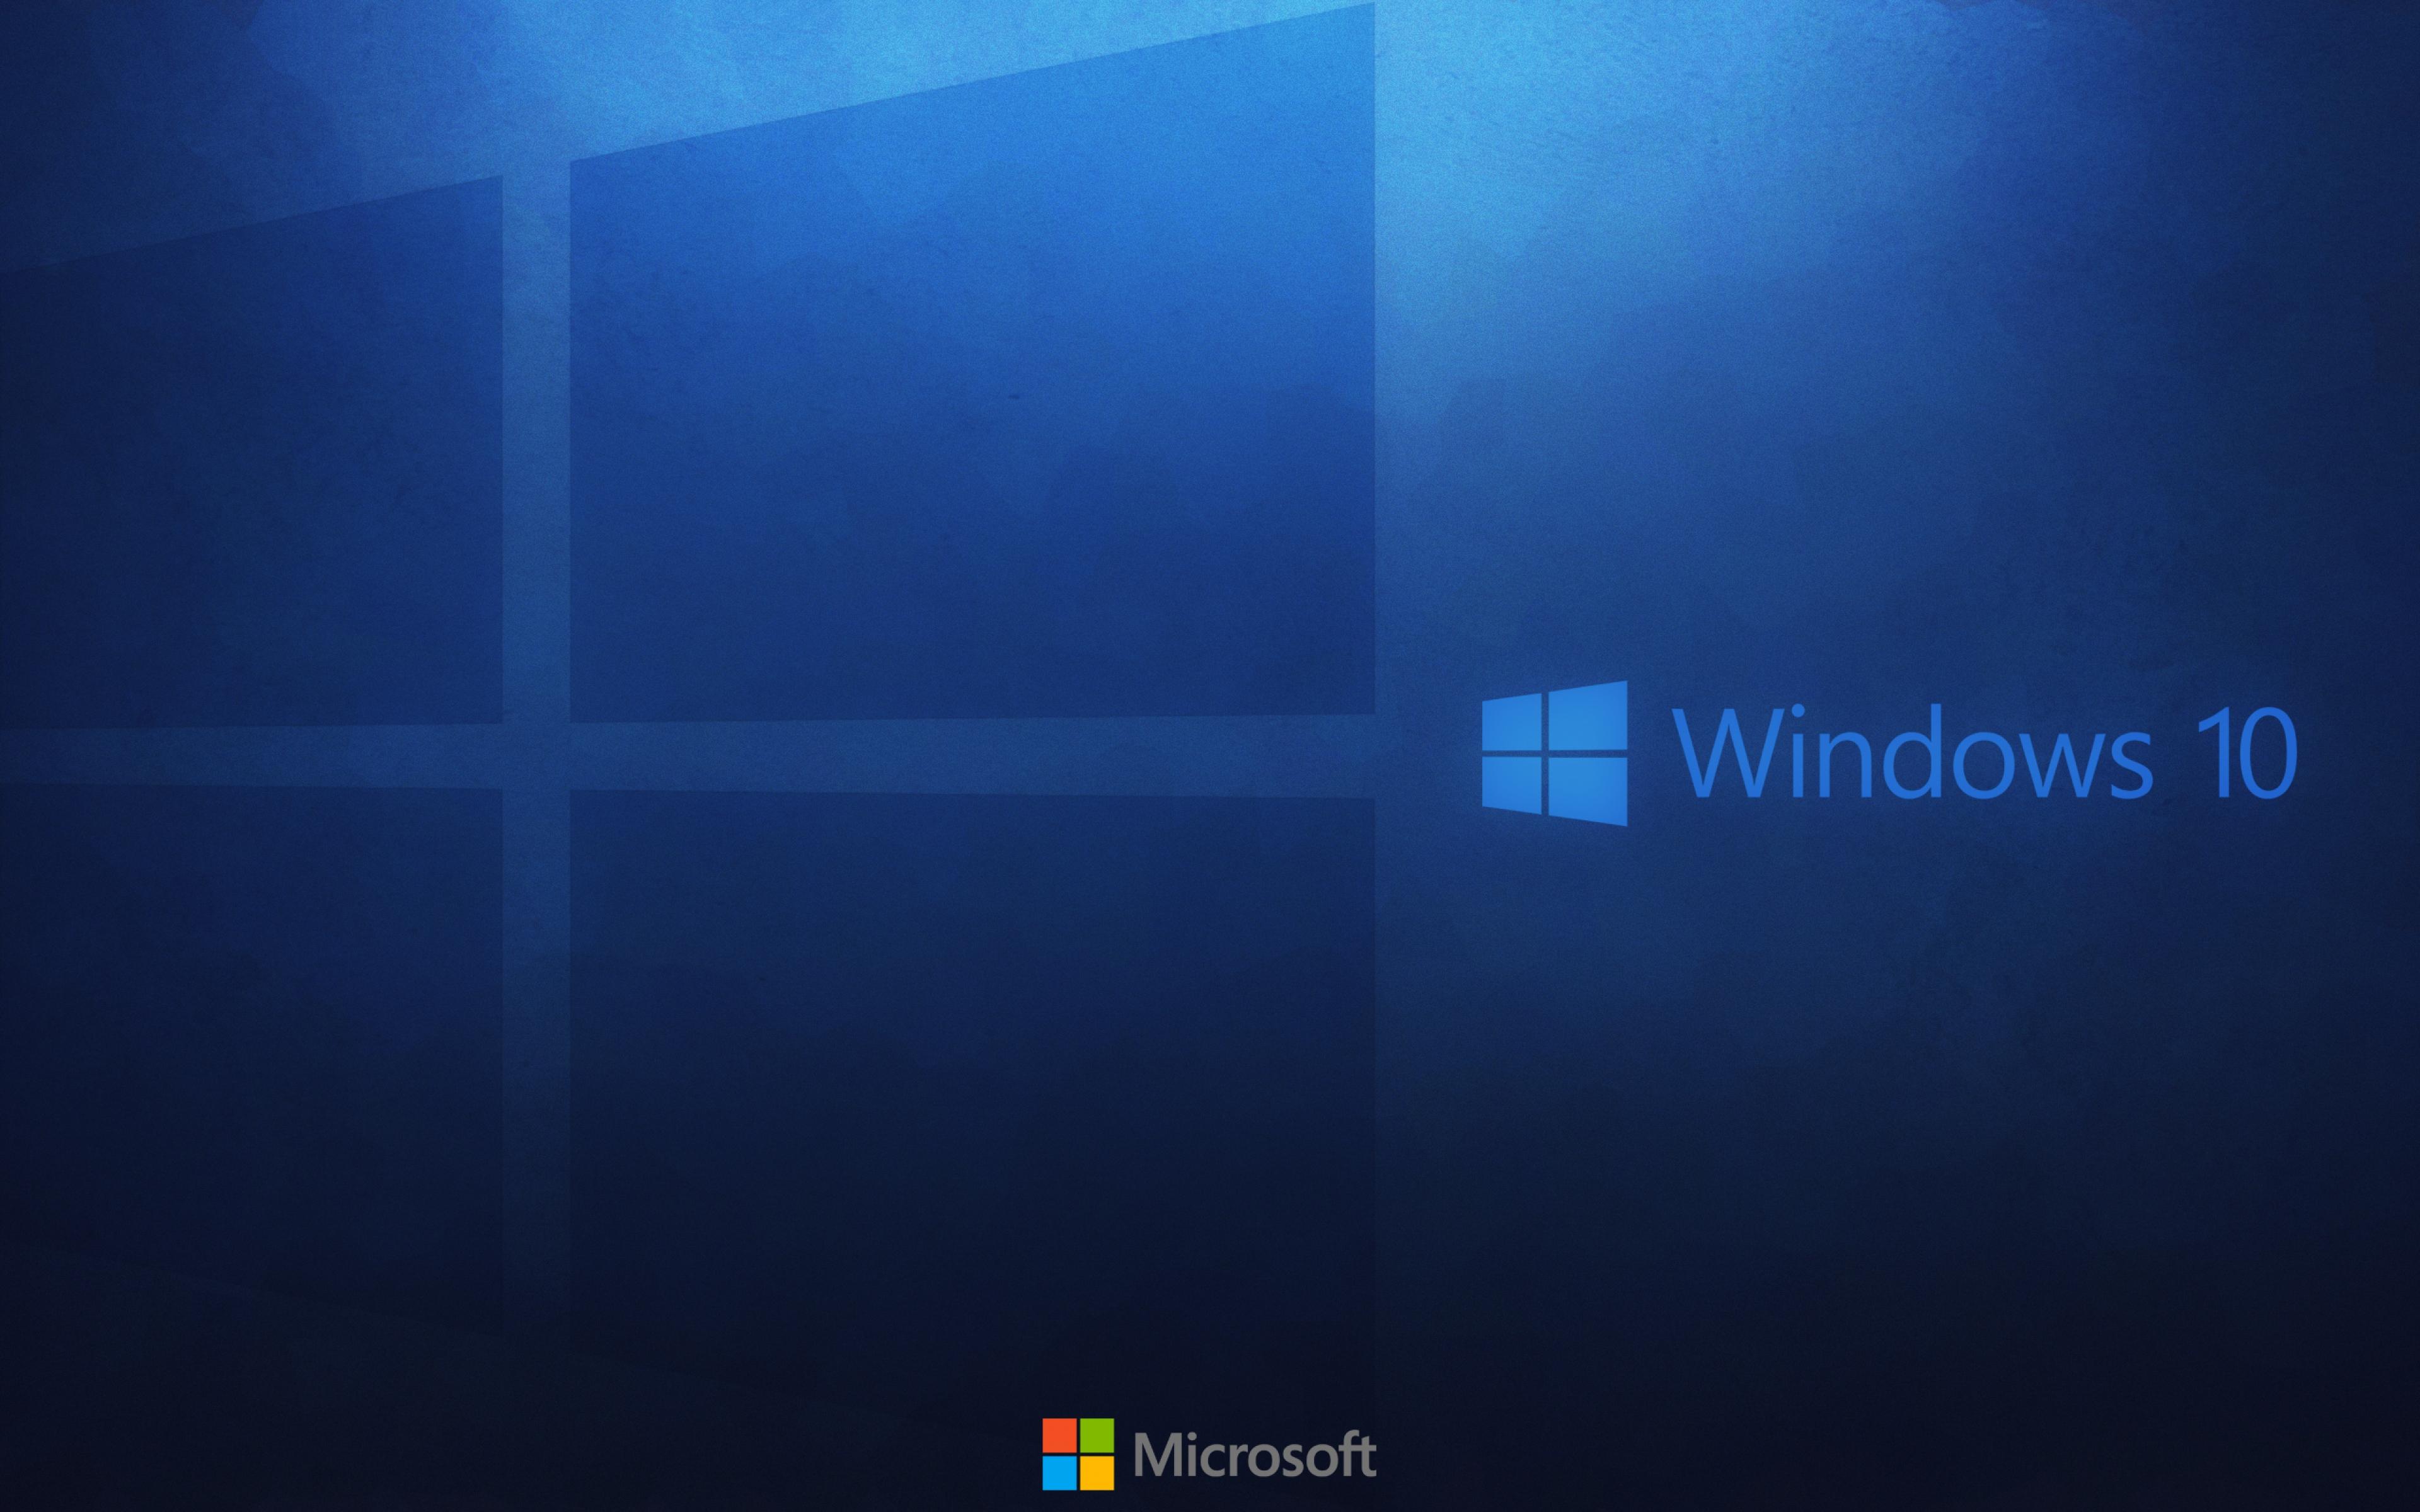 Windows 10 Blue Background Togowpartco